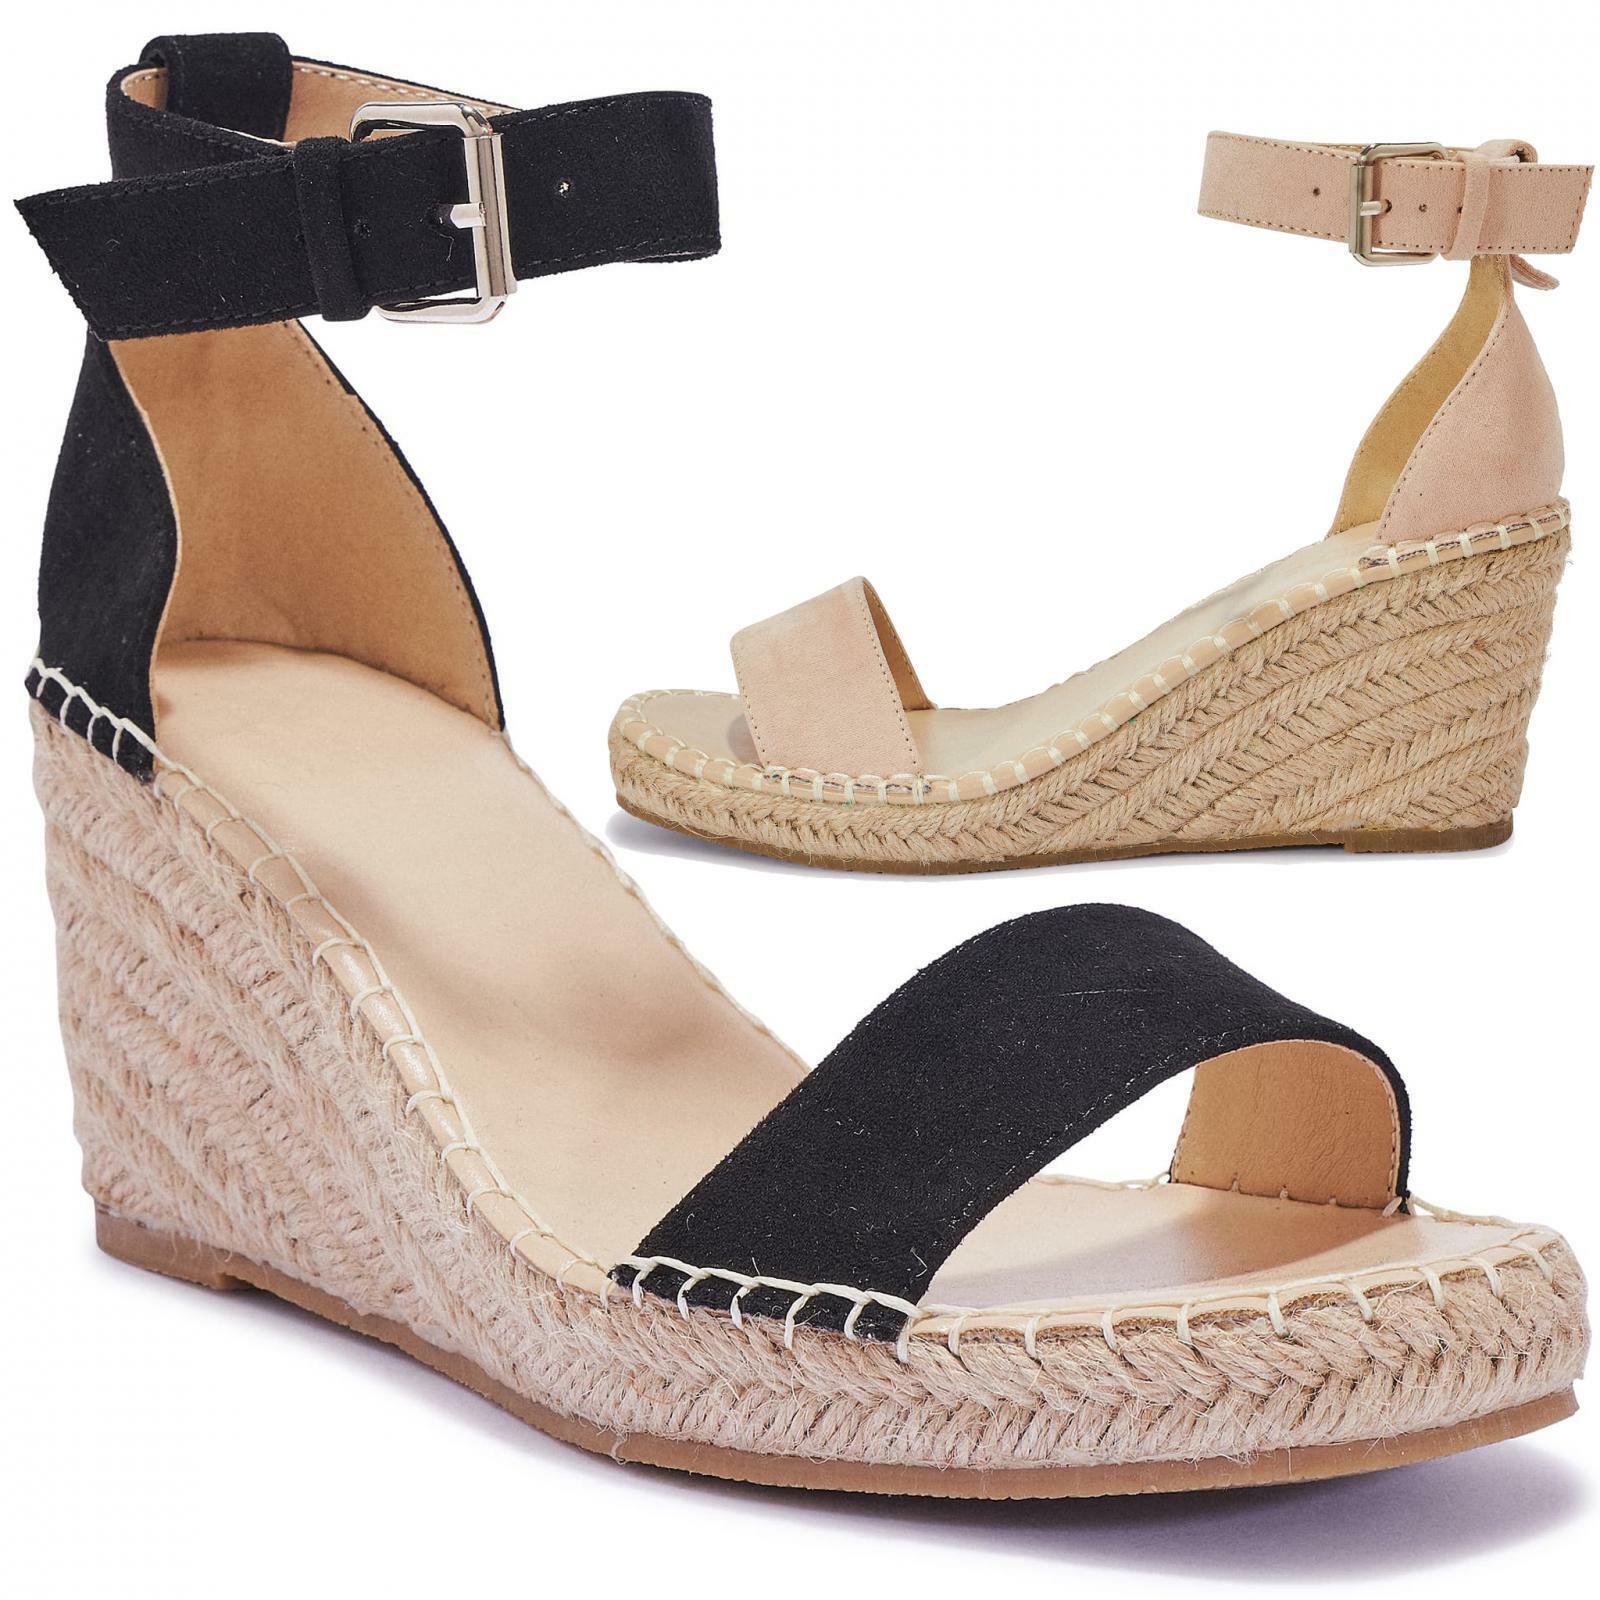 Hardy Wedge Sandal Nude Size 5.5 H8nz